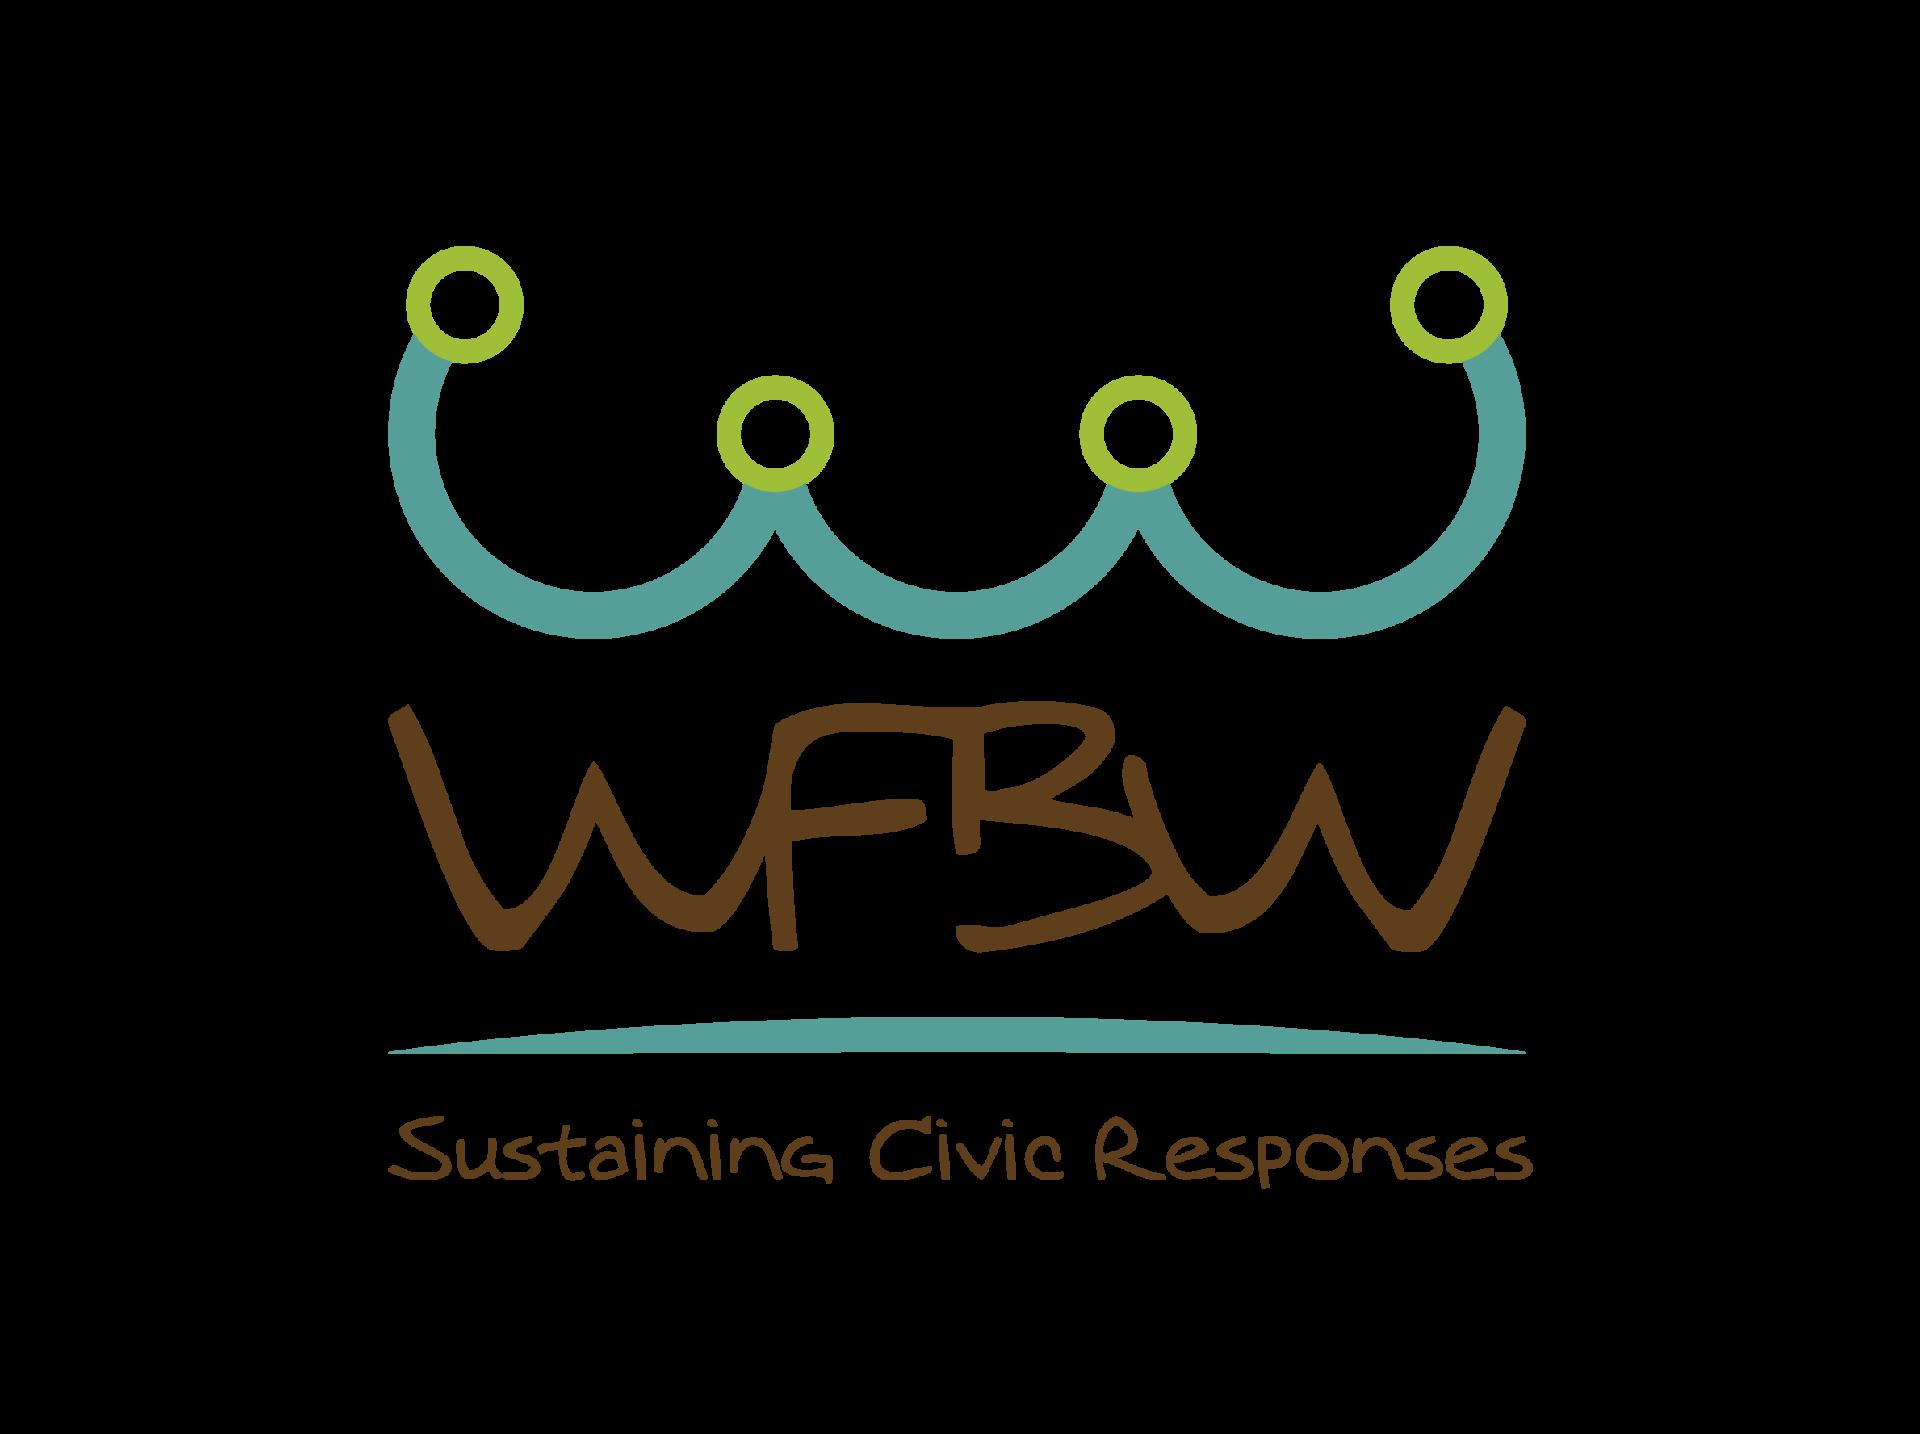 Logo progetto WFBW